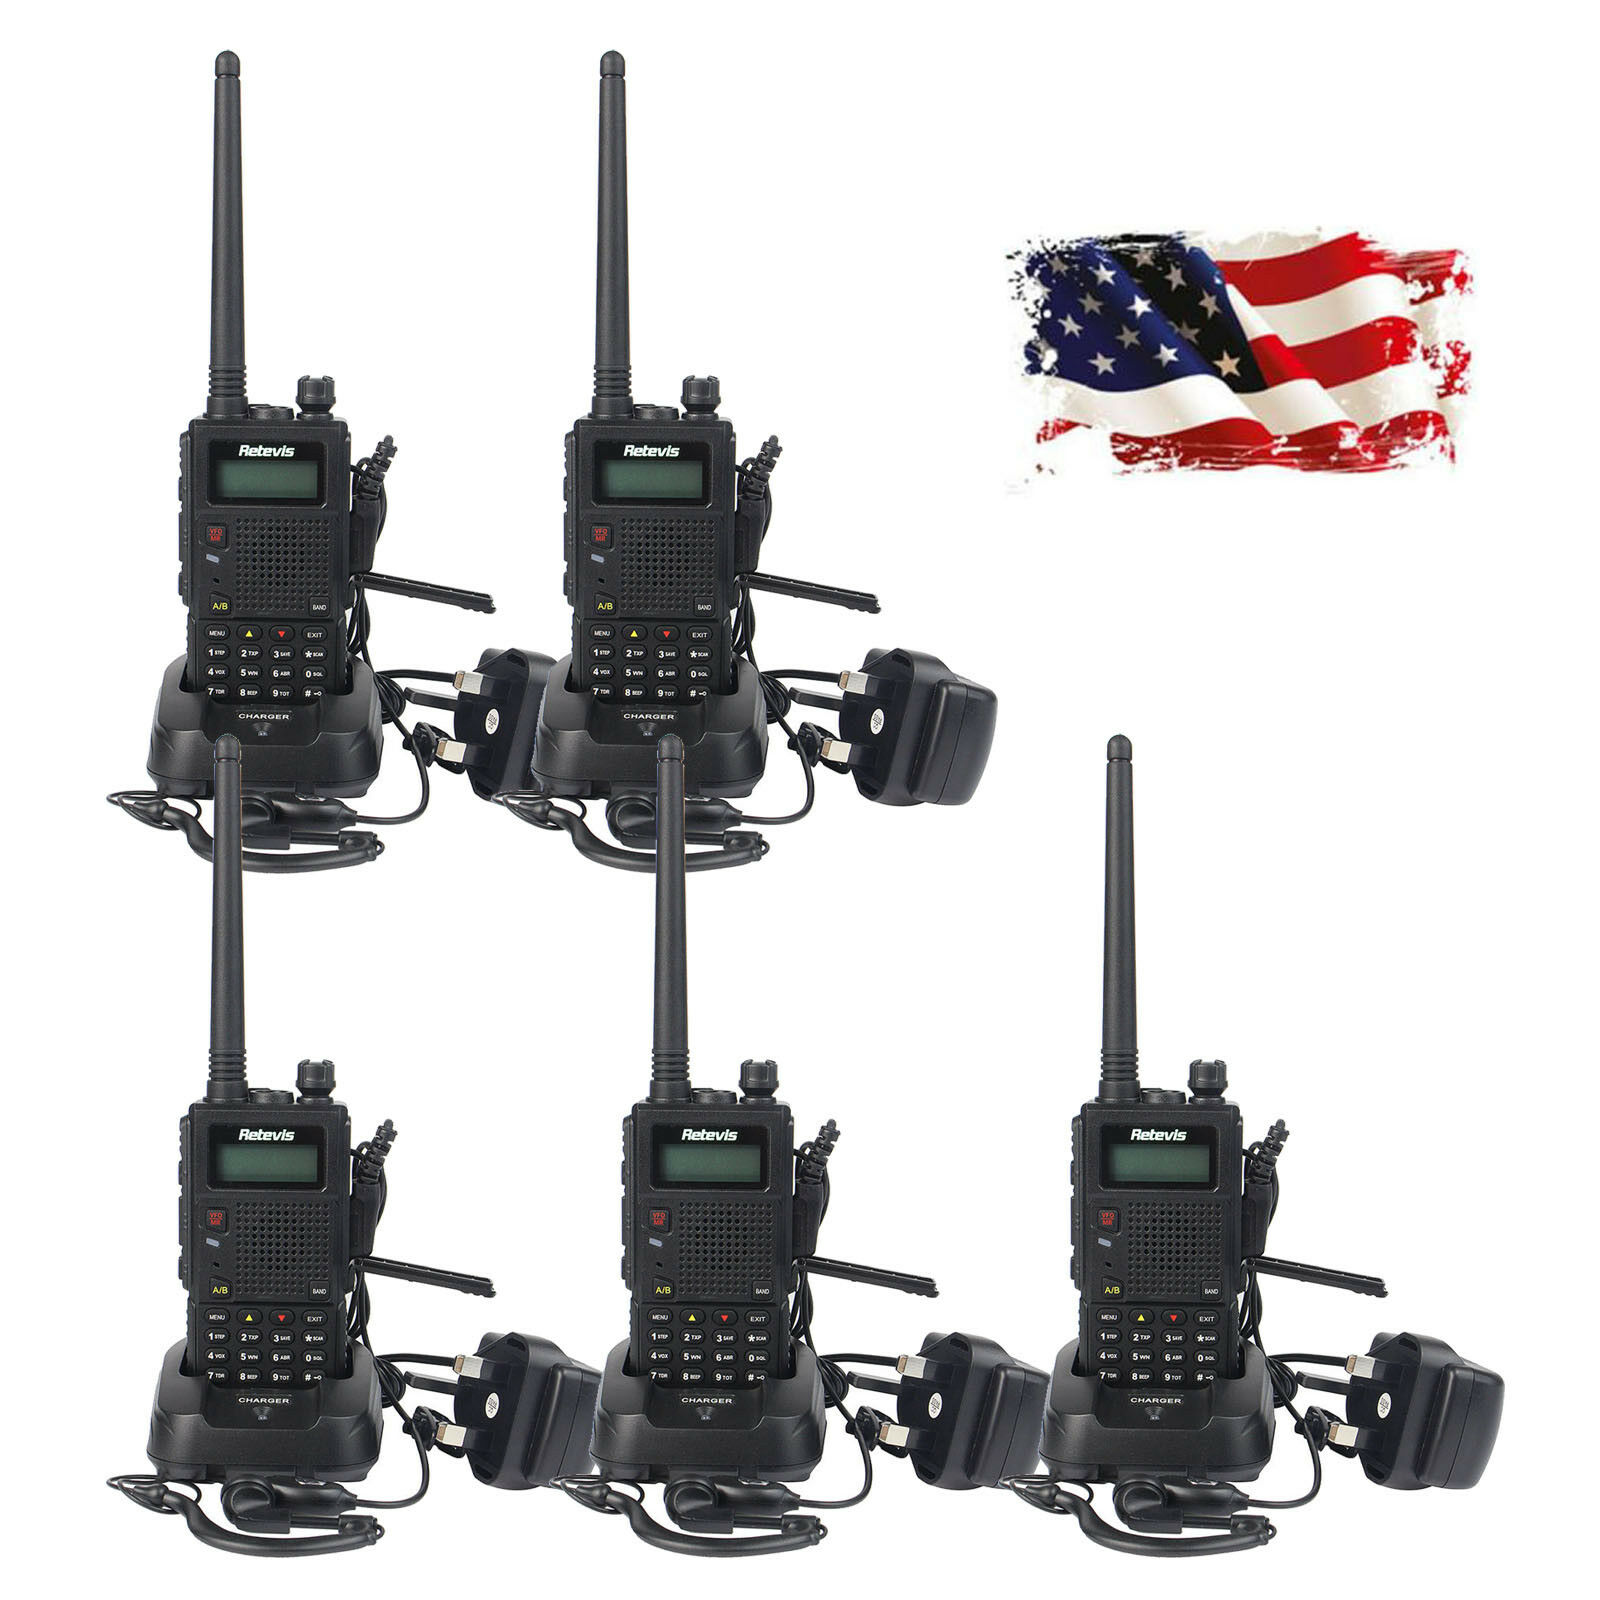 5XRetevis RT1 Walkie Talkies 10W UHF 400-520 MHz 16CH CTCSS//DCS 2-Way Radios US